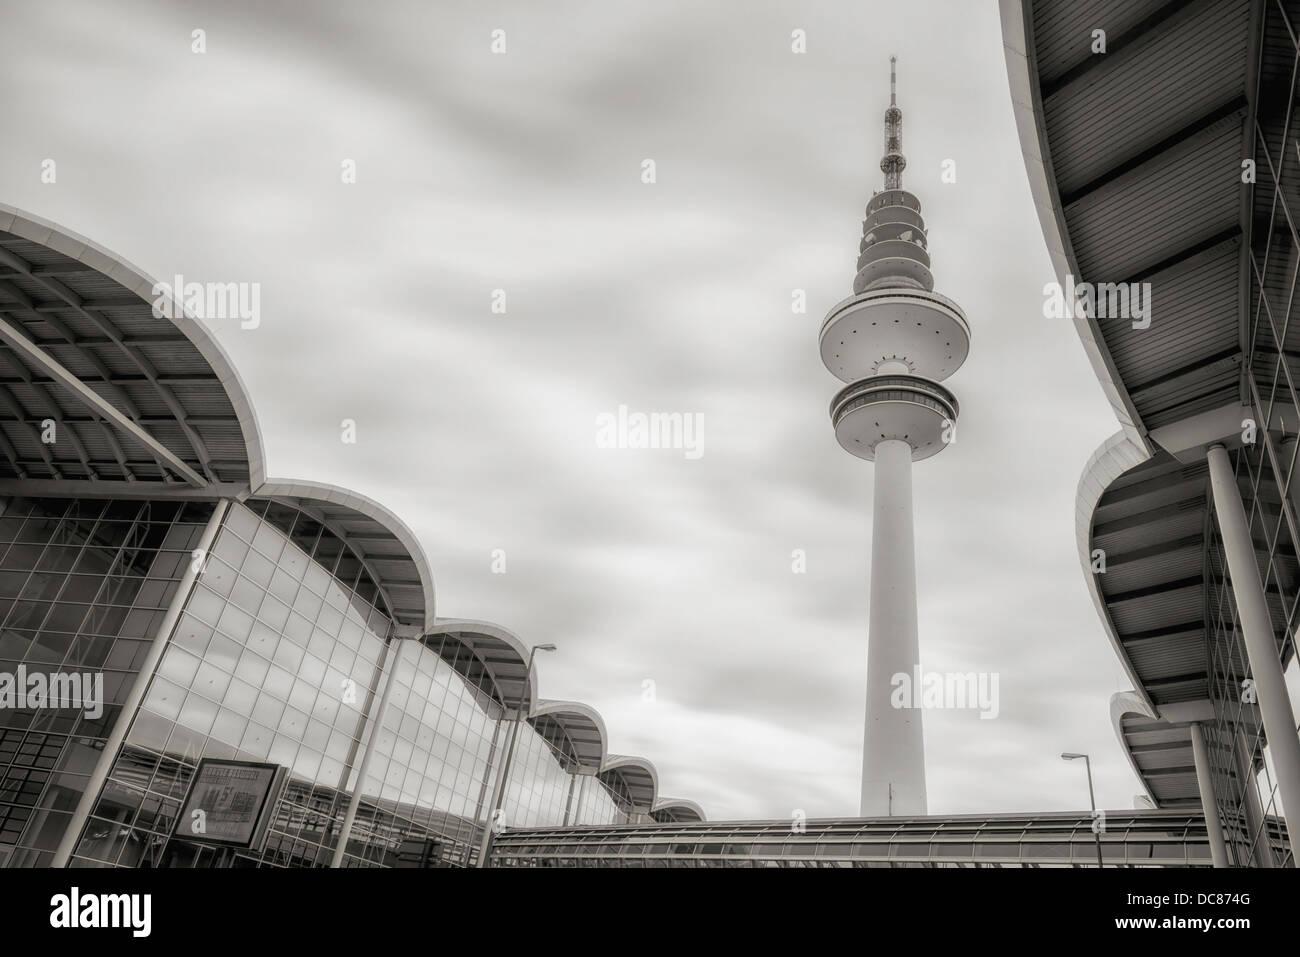 Fernsehturm Hamburg - Heinrich-Hertz-Turm - Tele-Michel - Stock Image